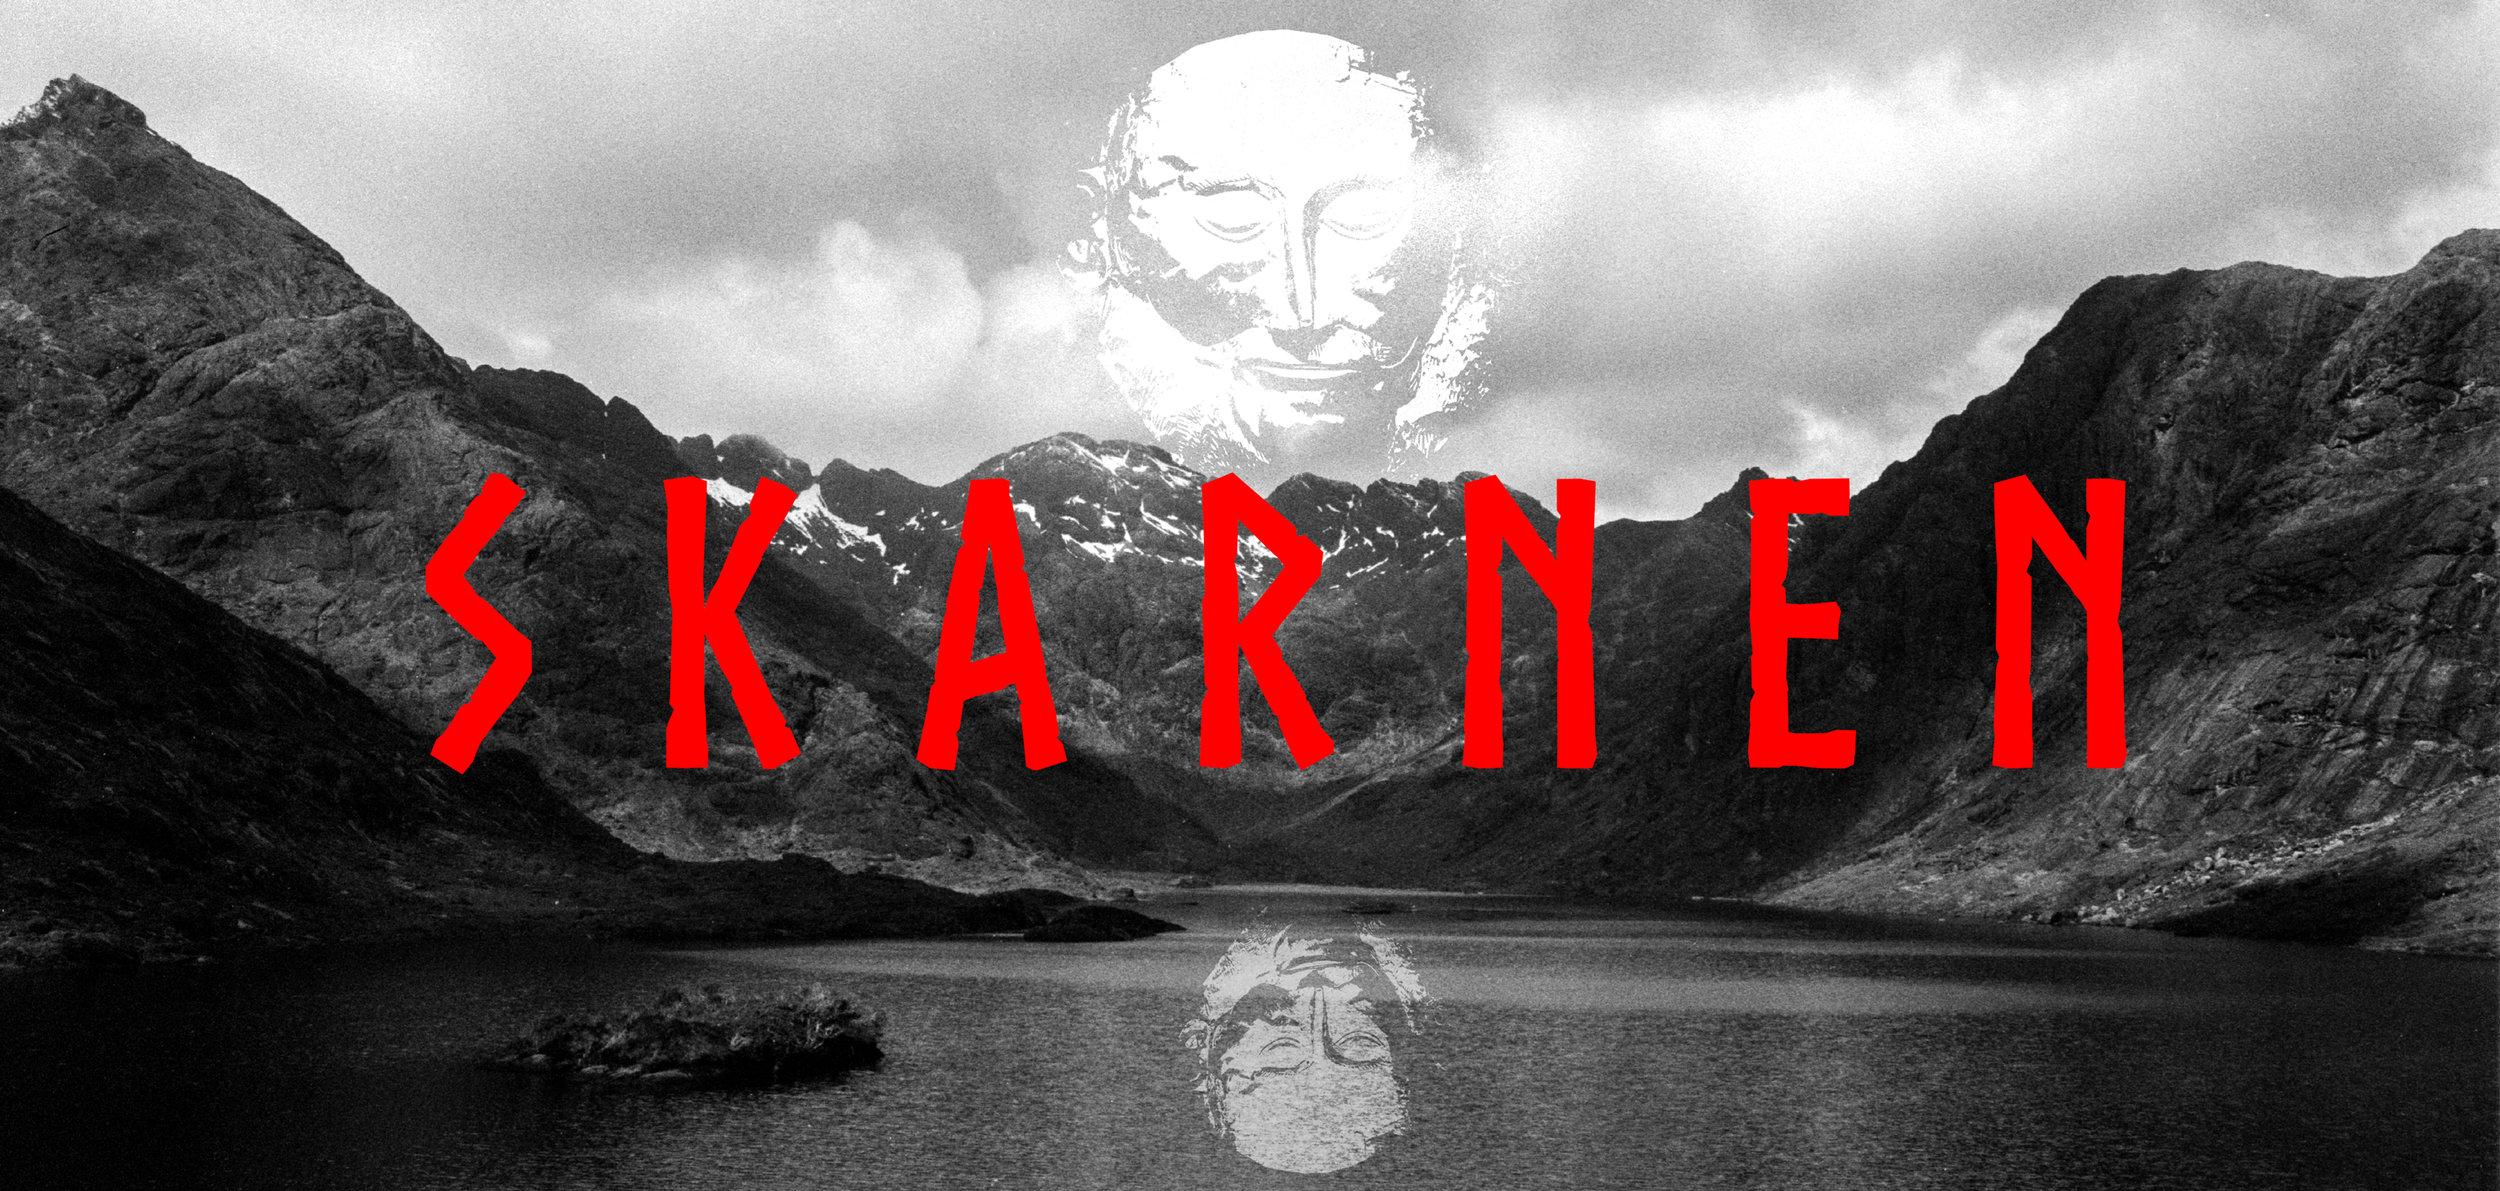 Banner I made for the press release of 'Skarnen'.